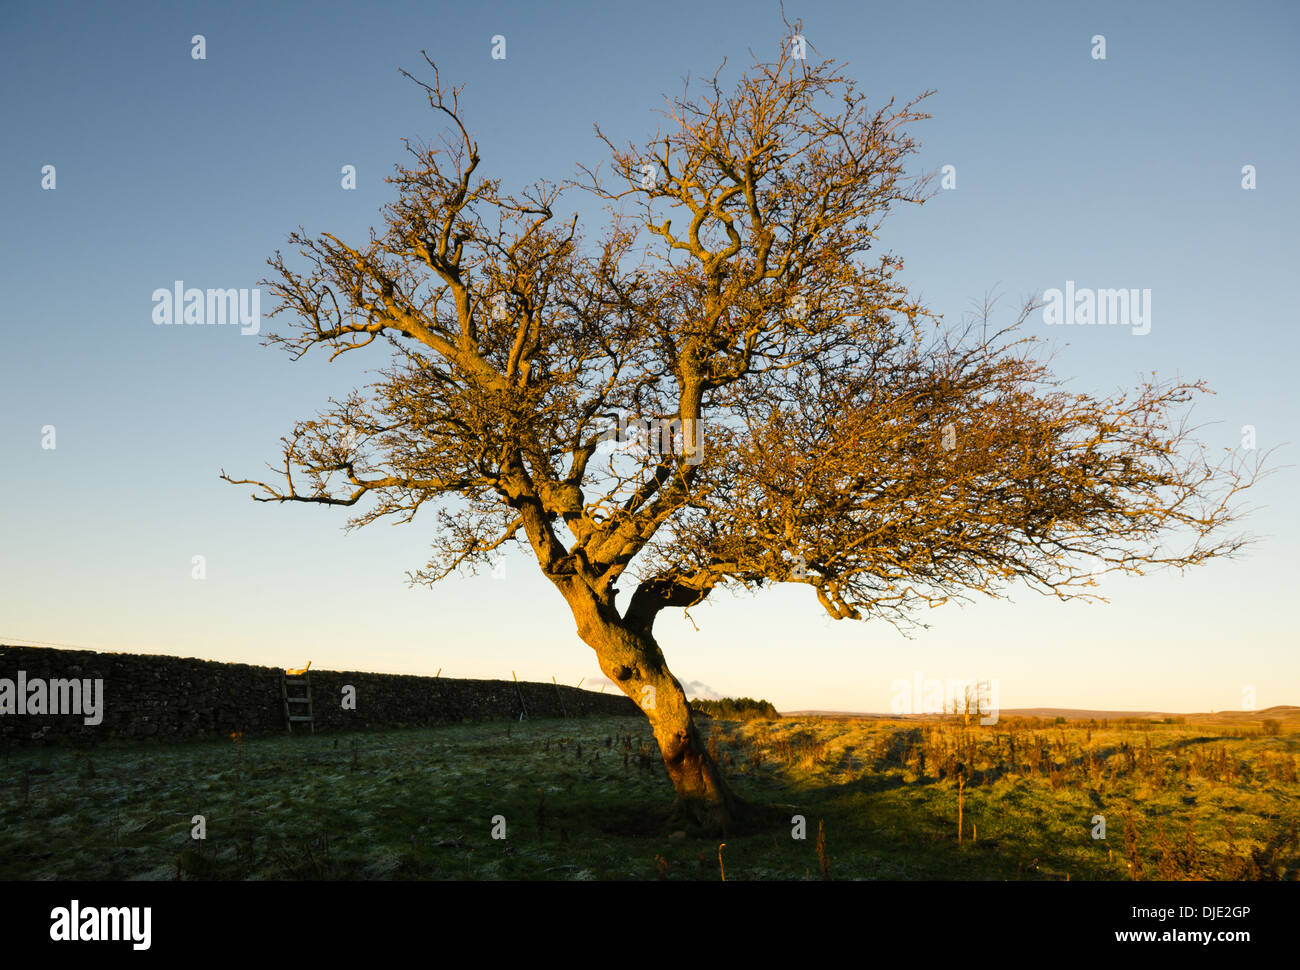 Winter hawthorn tree on farmland - Stock Image